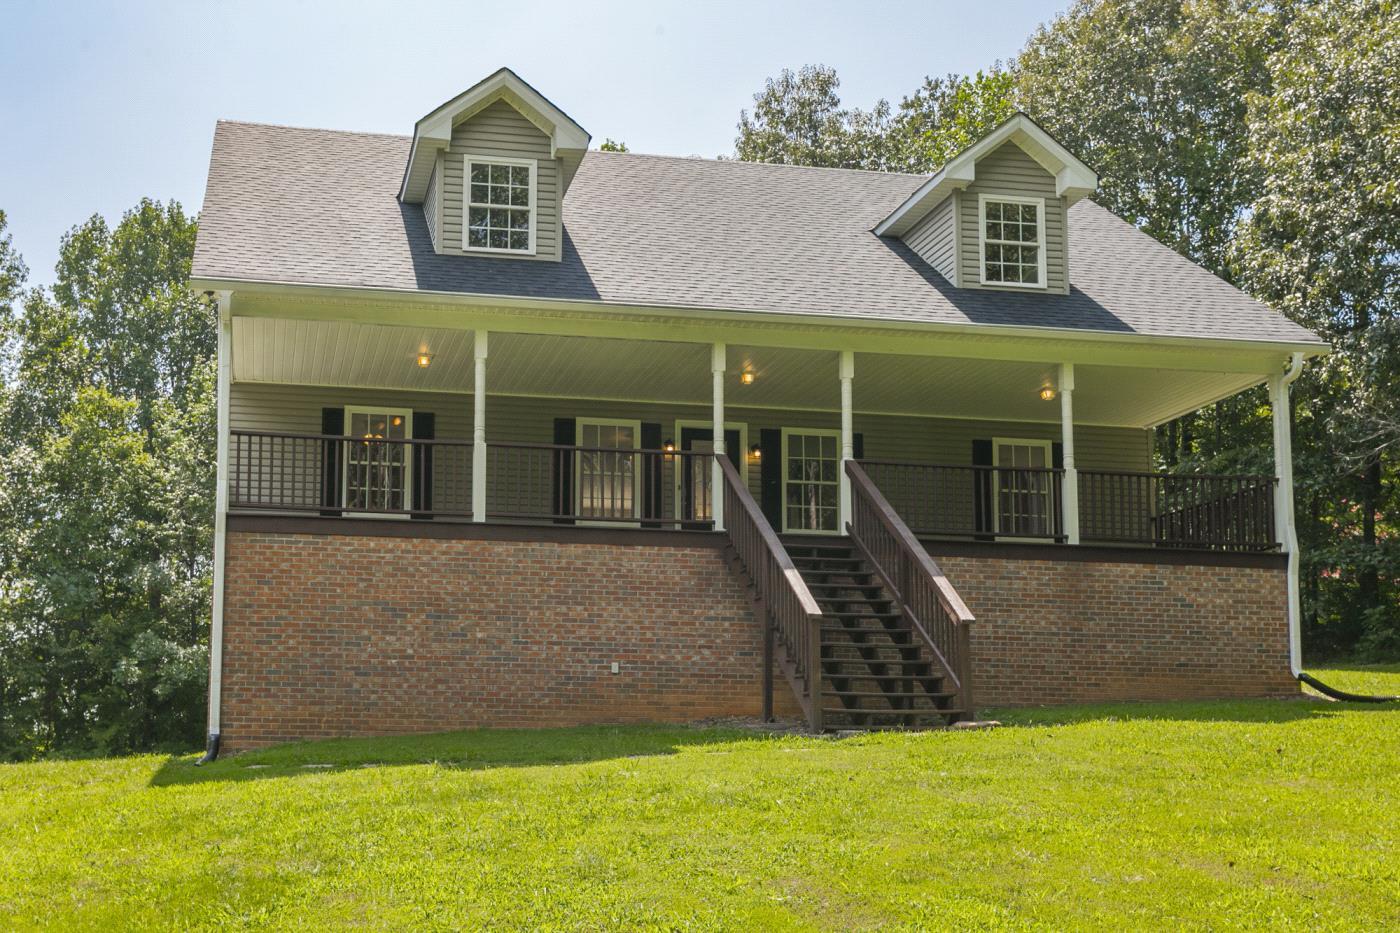 3951 Kinneys Rd, Cedar Hill, TN 37032 - Cedar Hill, TN real estate listing